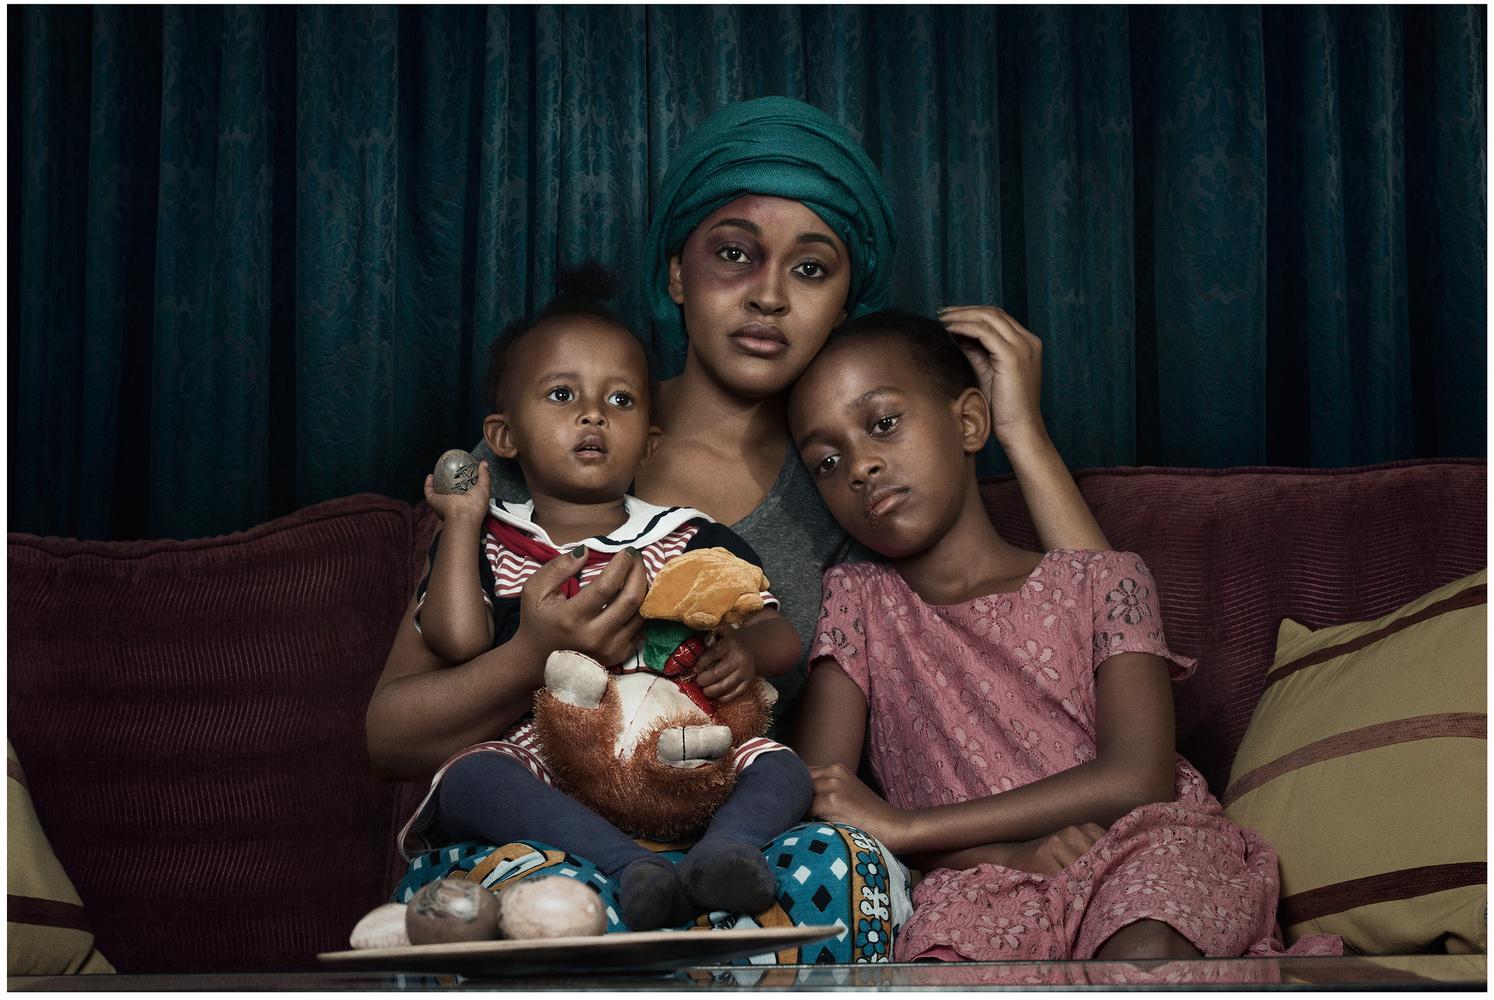 GVRC:Domestic Violence by Kamau Patrick